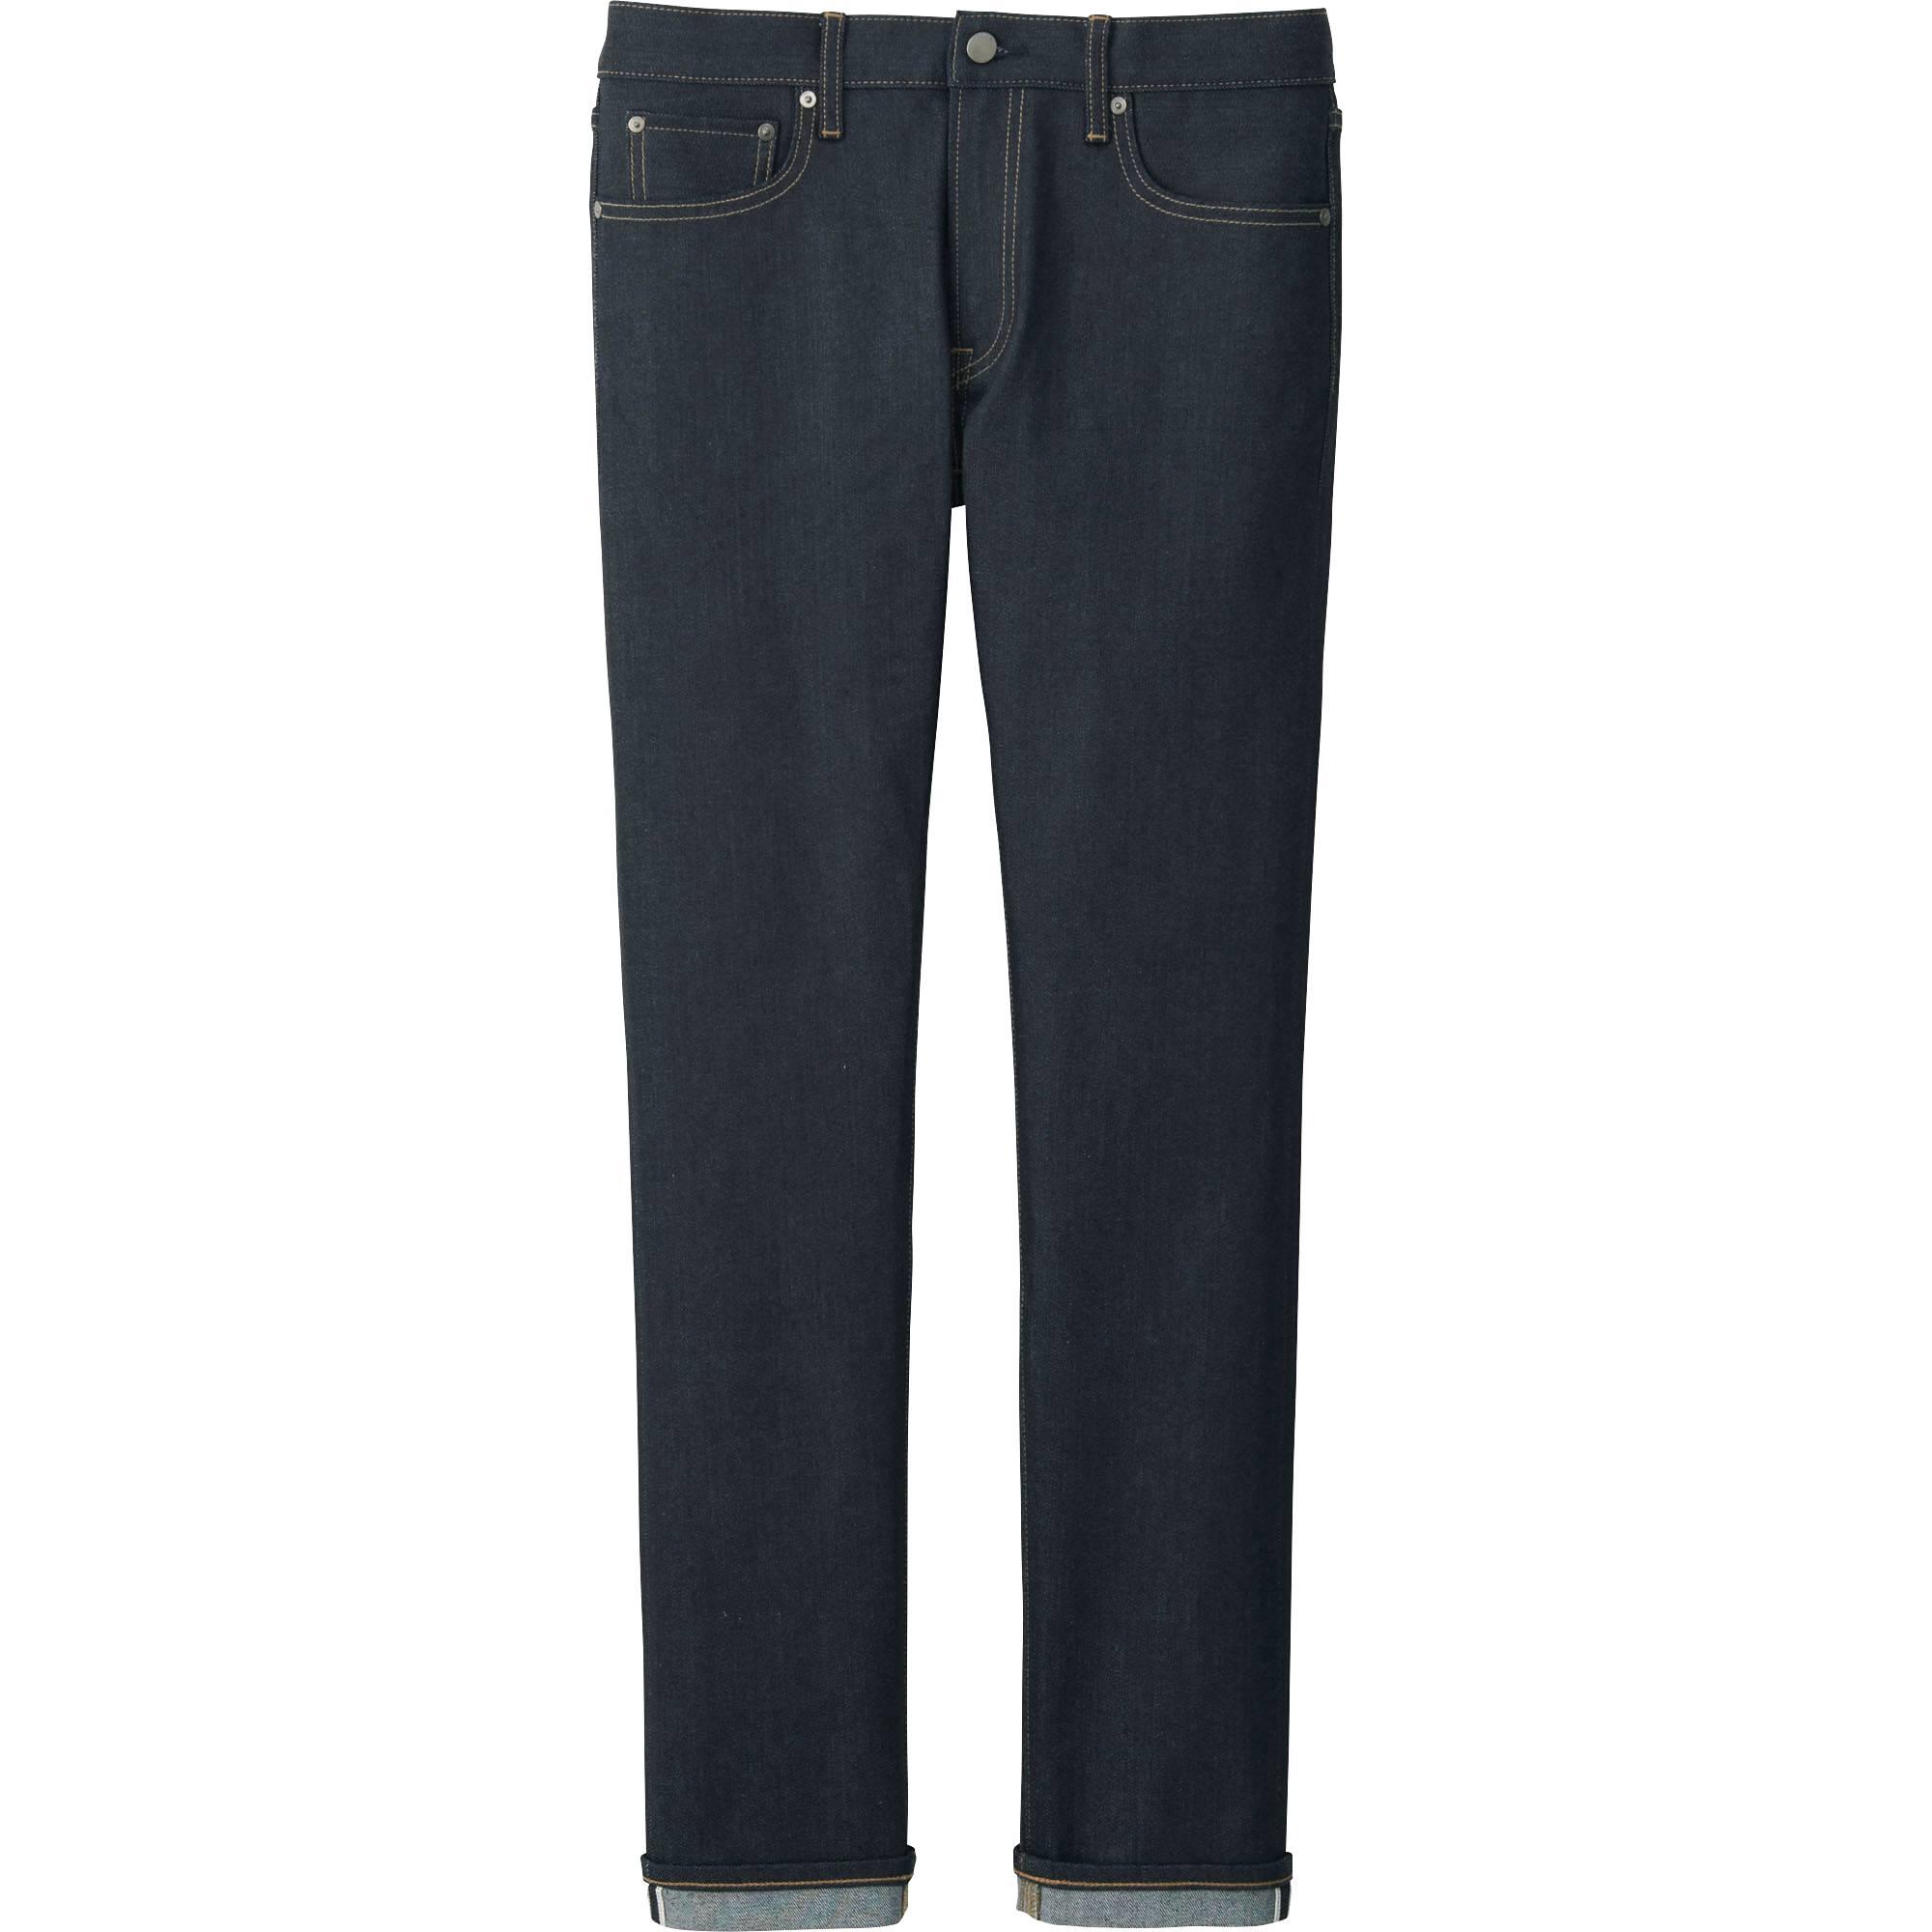 Men&39s Stretch Selvedge Slim-Fit Jeans | UNIQLO US